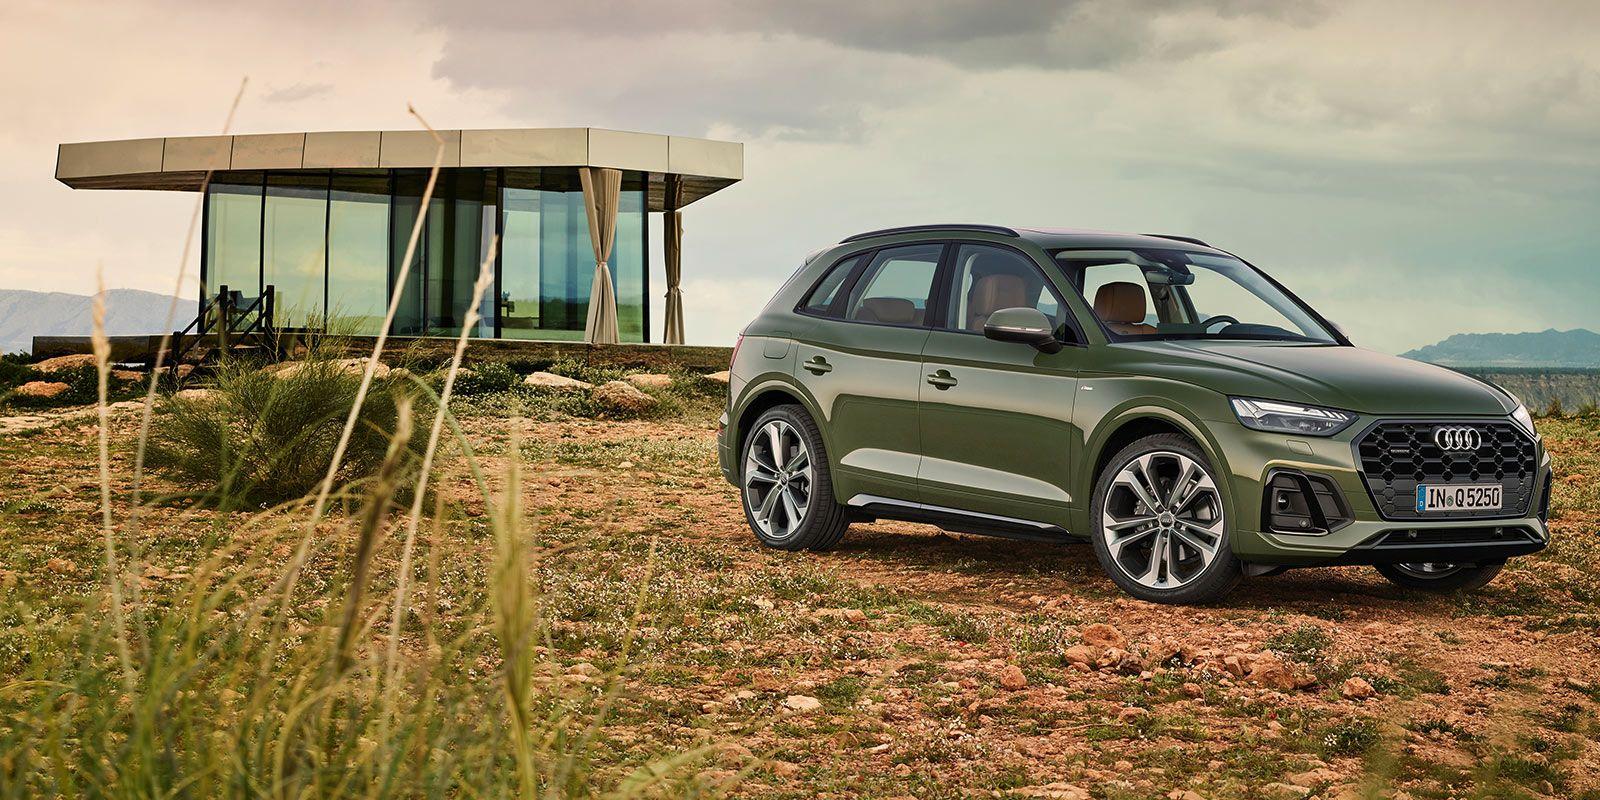 2021 Audi Sq5 Model